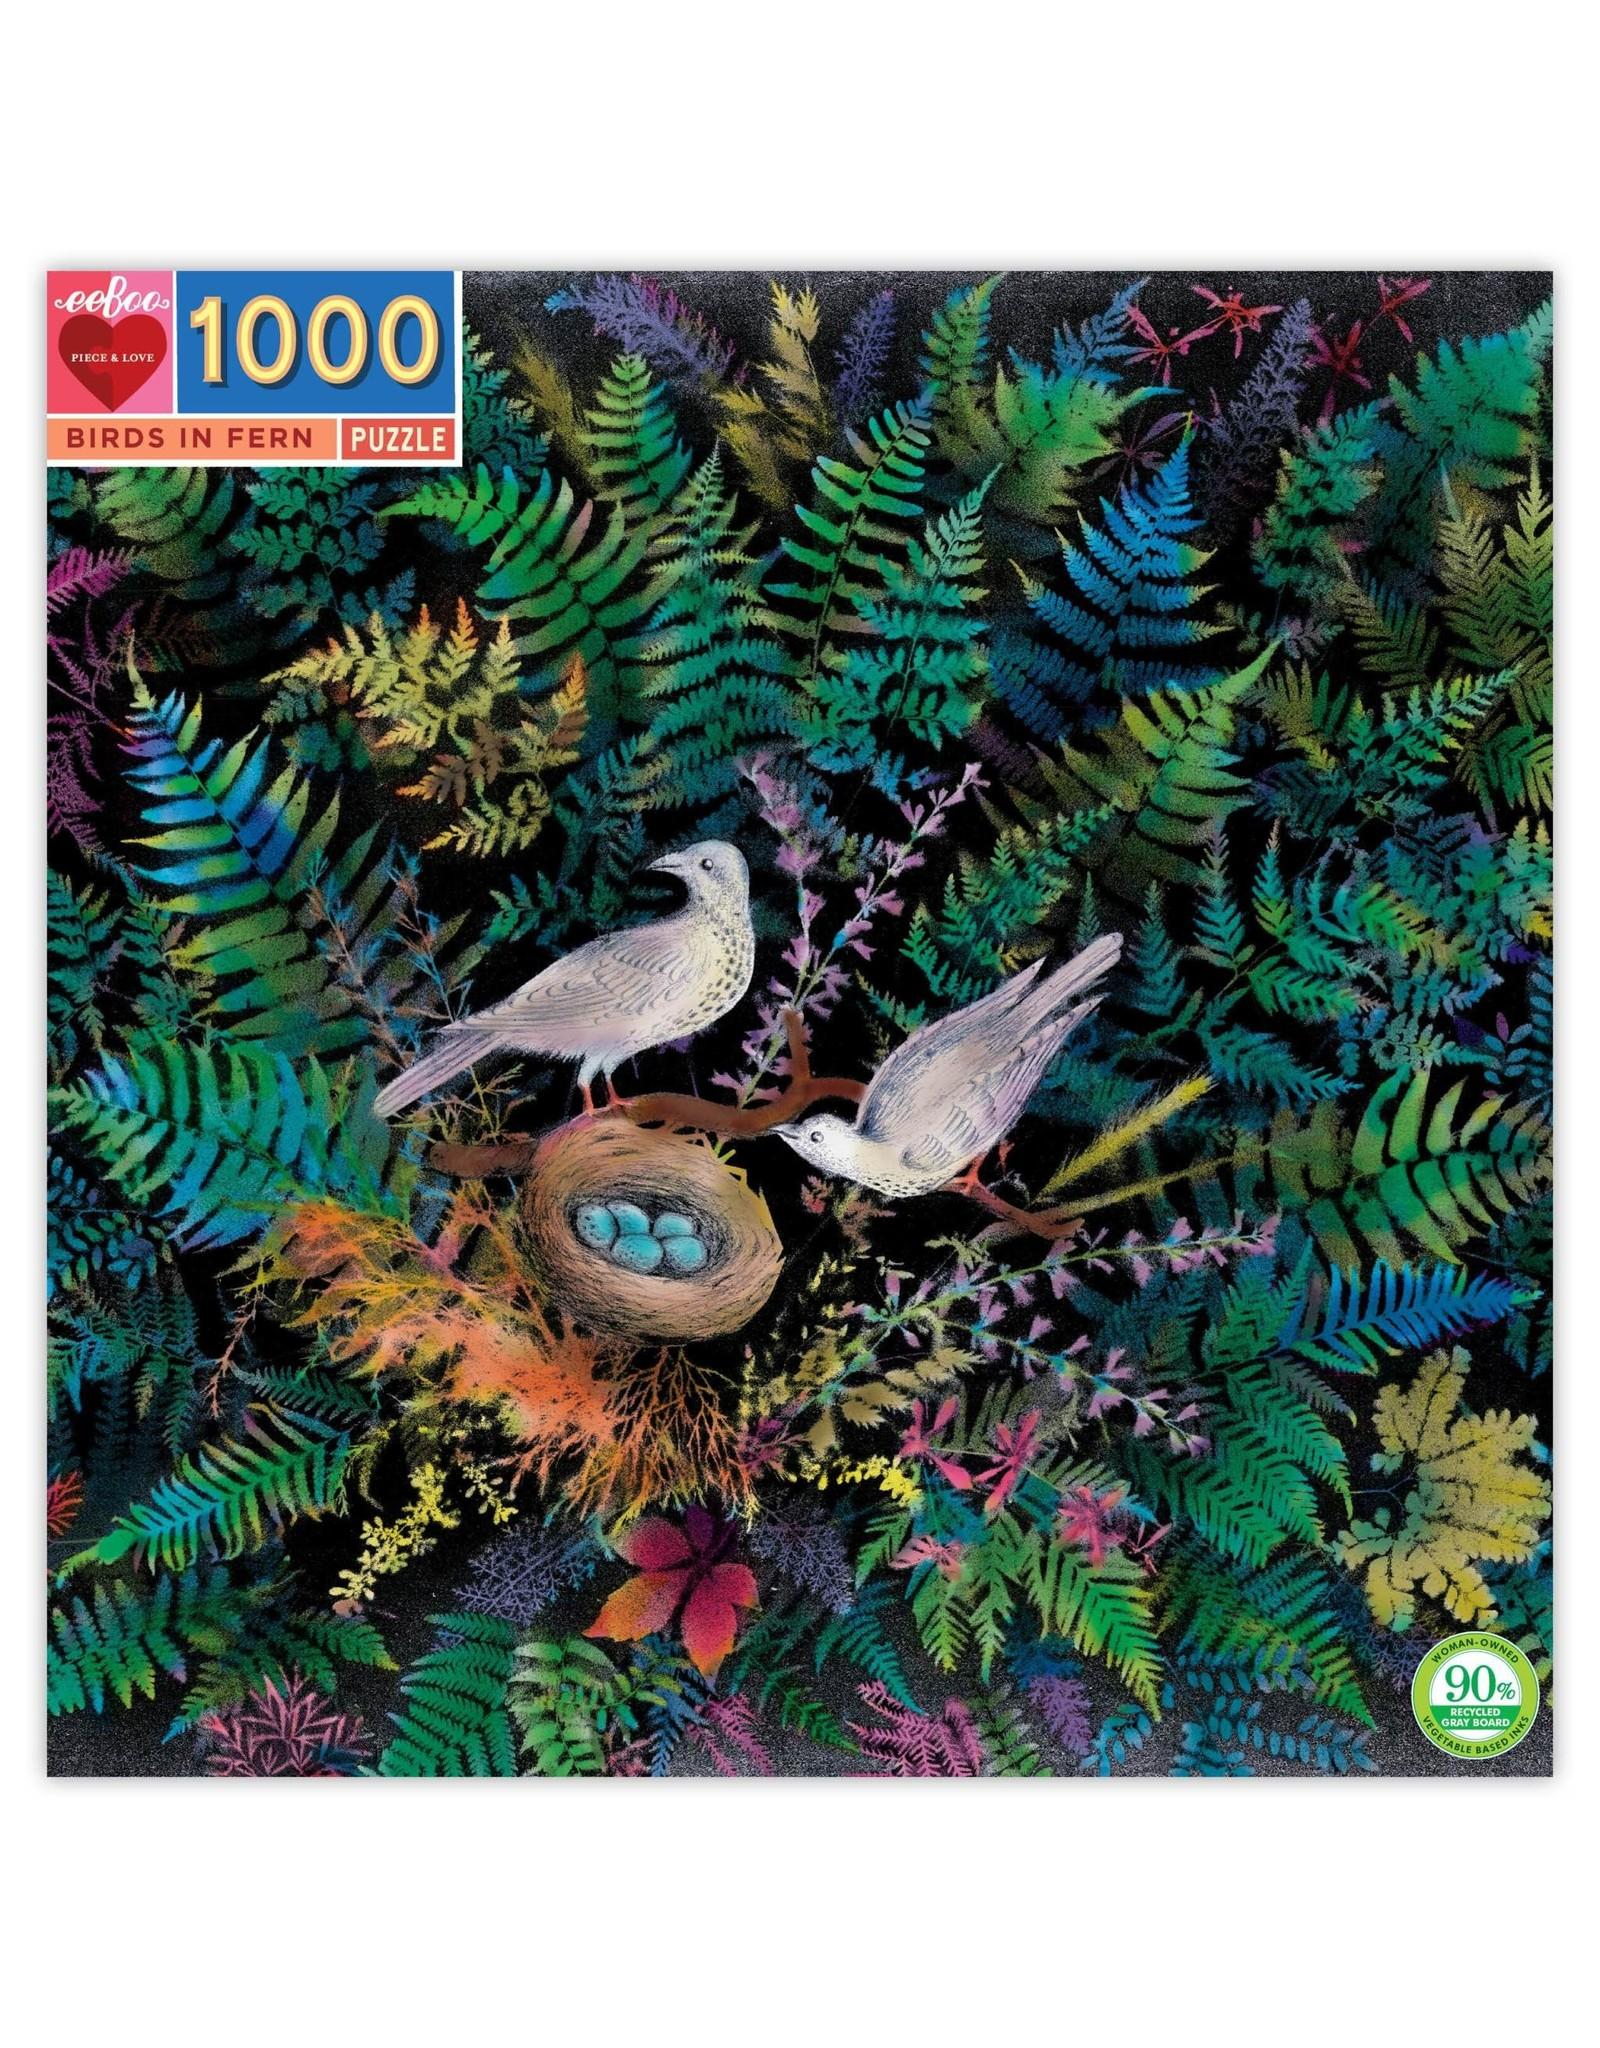 Eeboo 1000 pcs. Birds in Fern Puzzle